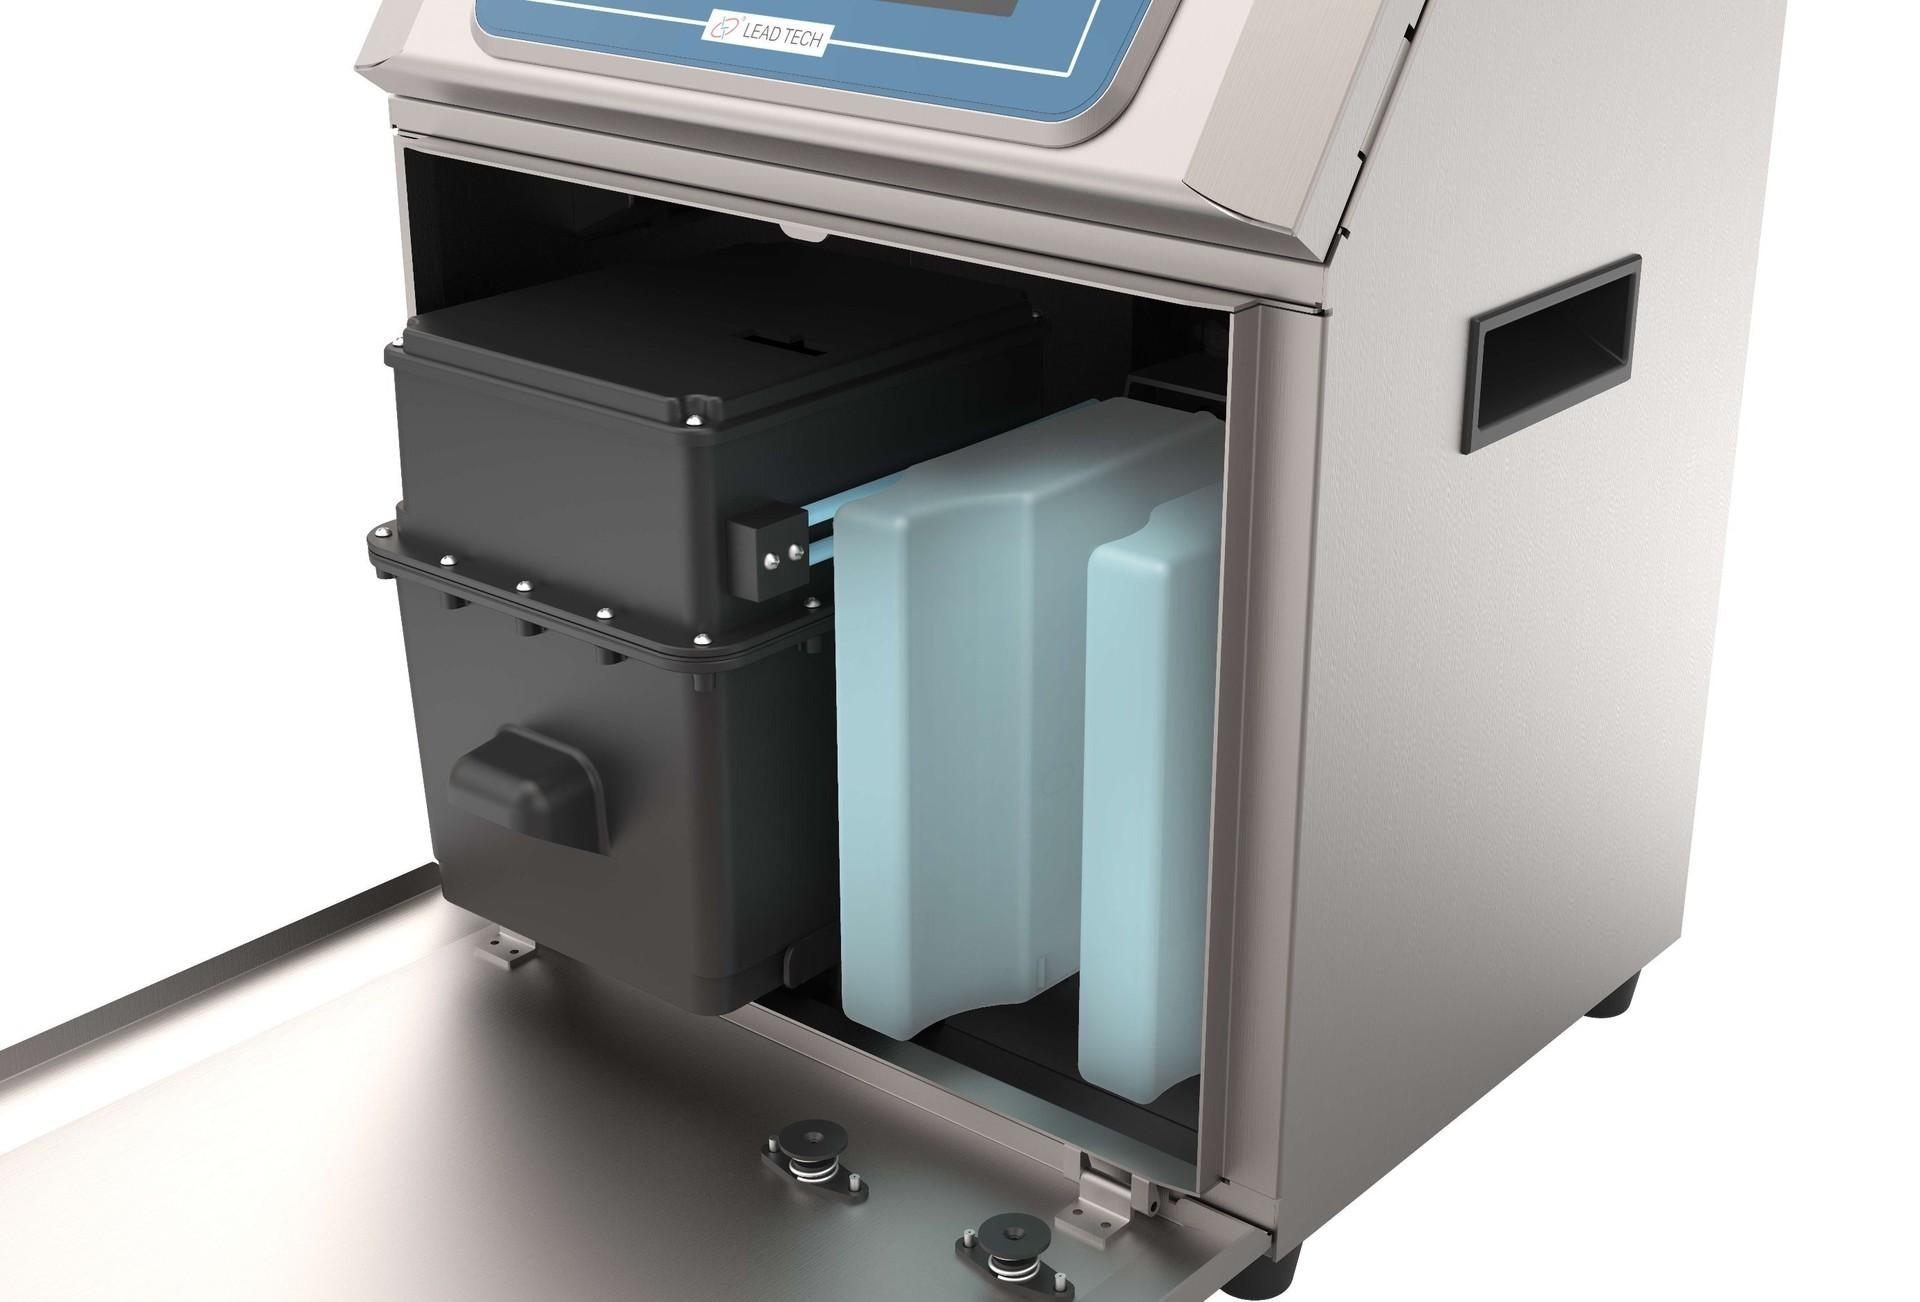 Lead Tech Lt800 Coding Machine Cij Inkjet Printer